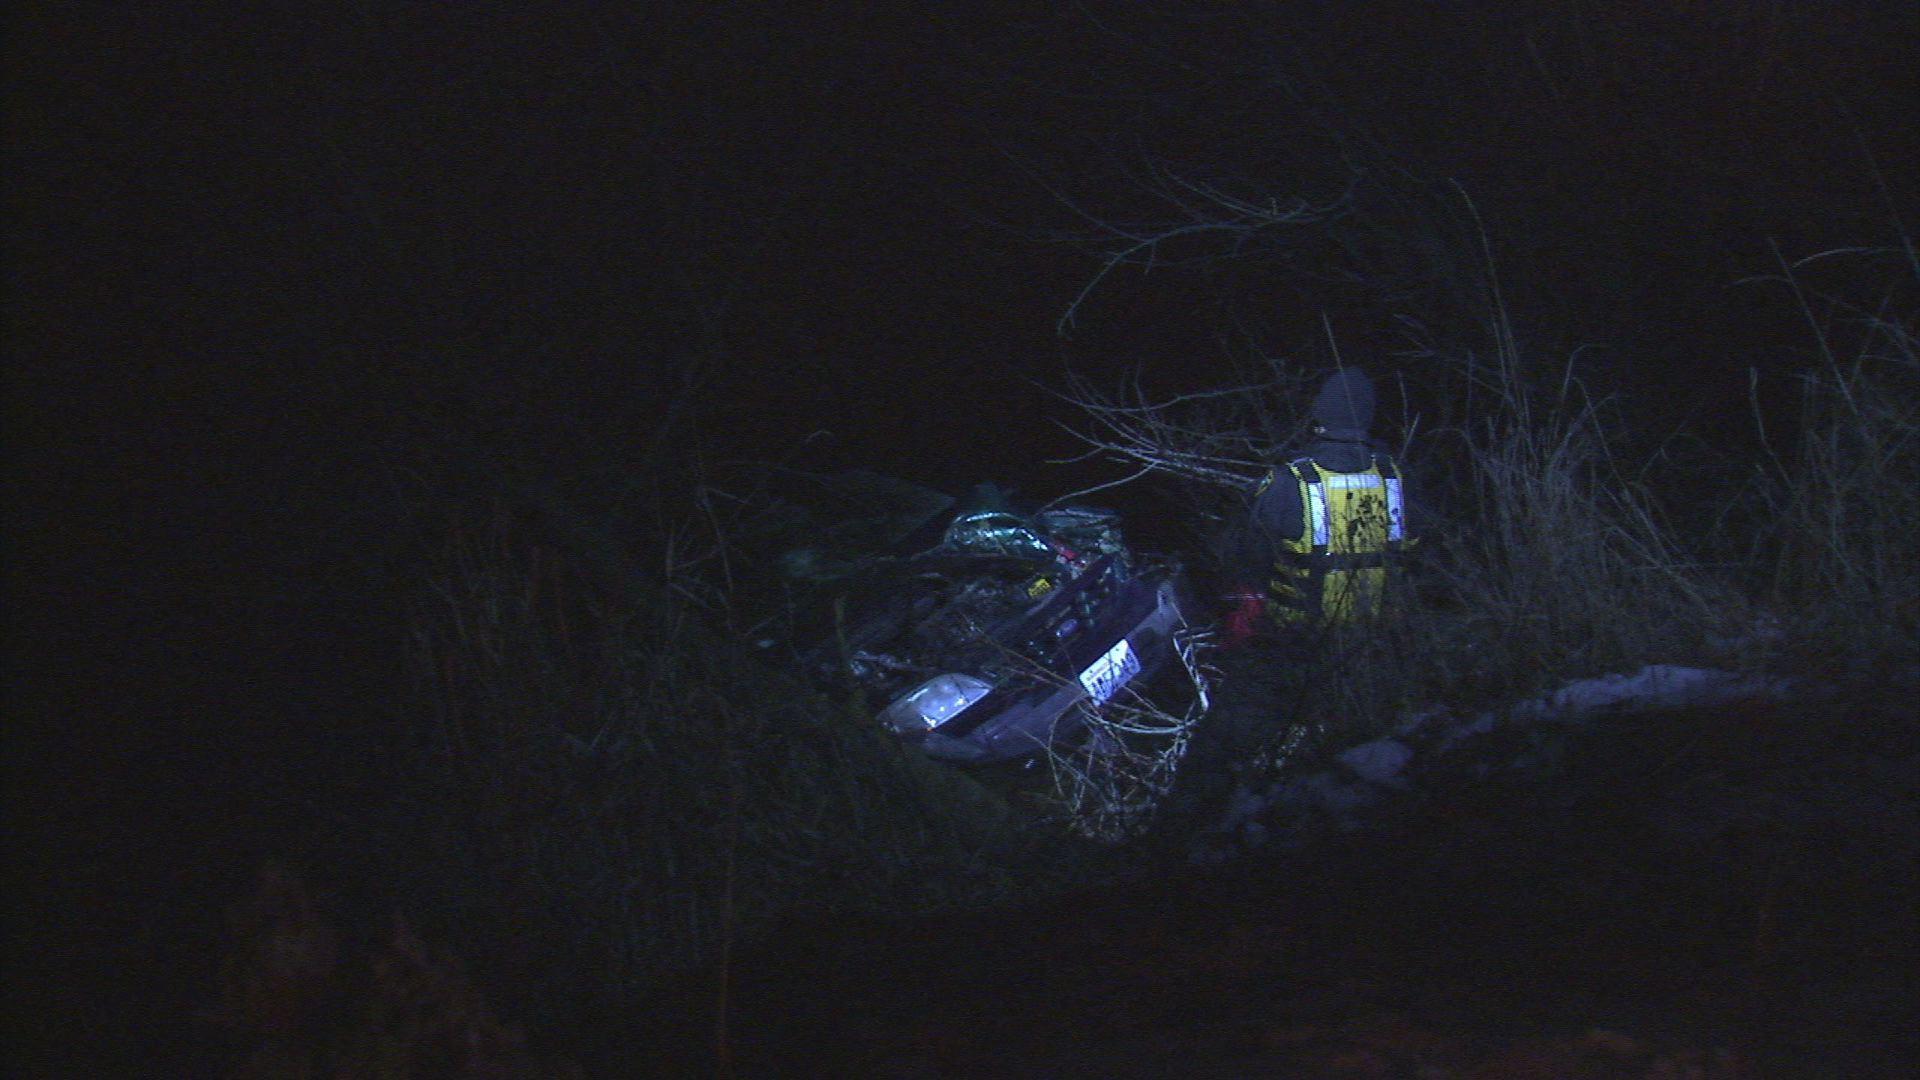 Car crashes into spokane river nbc right now kndo kndu tri cities